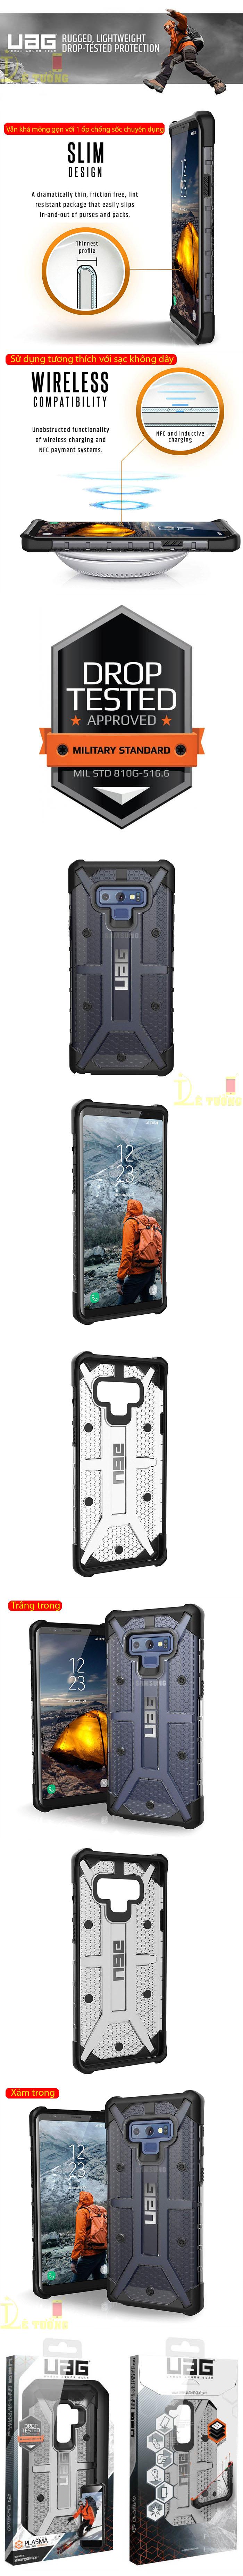 Ốp lưng Galaxy Note 9 UAG Plasma Armor trong suốt, chống sốc từ USA 3